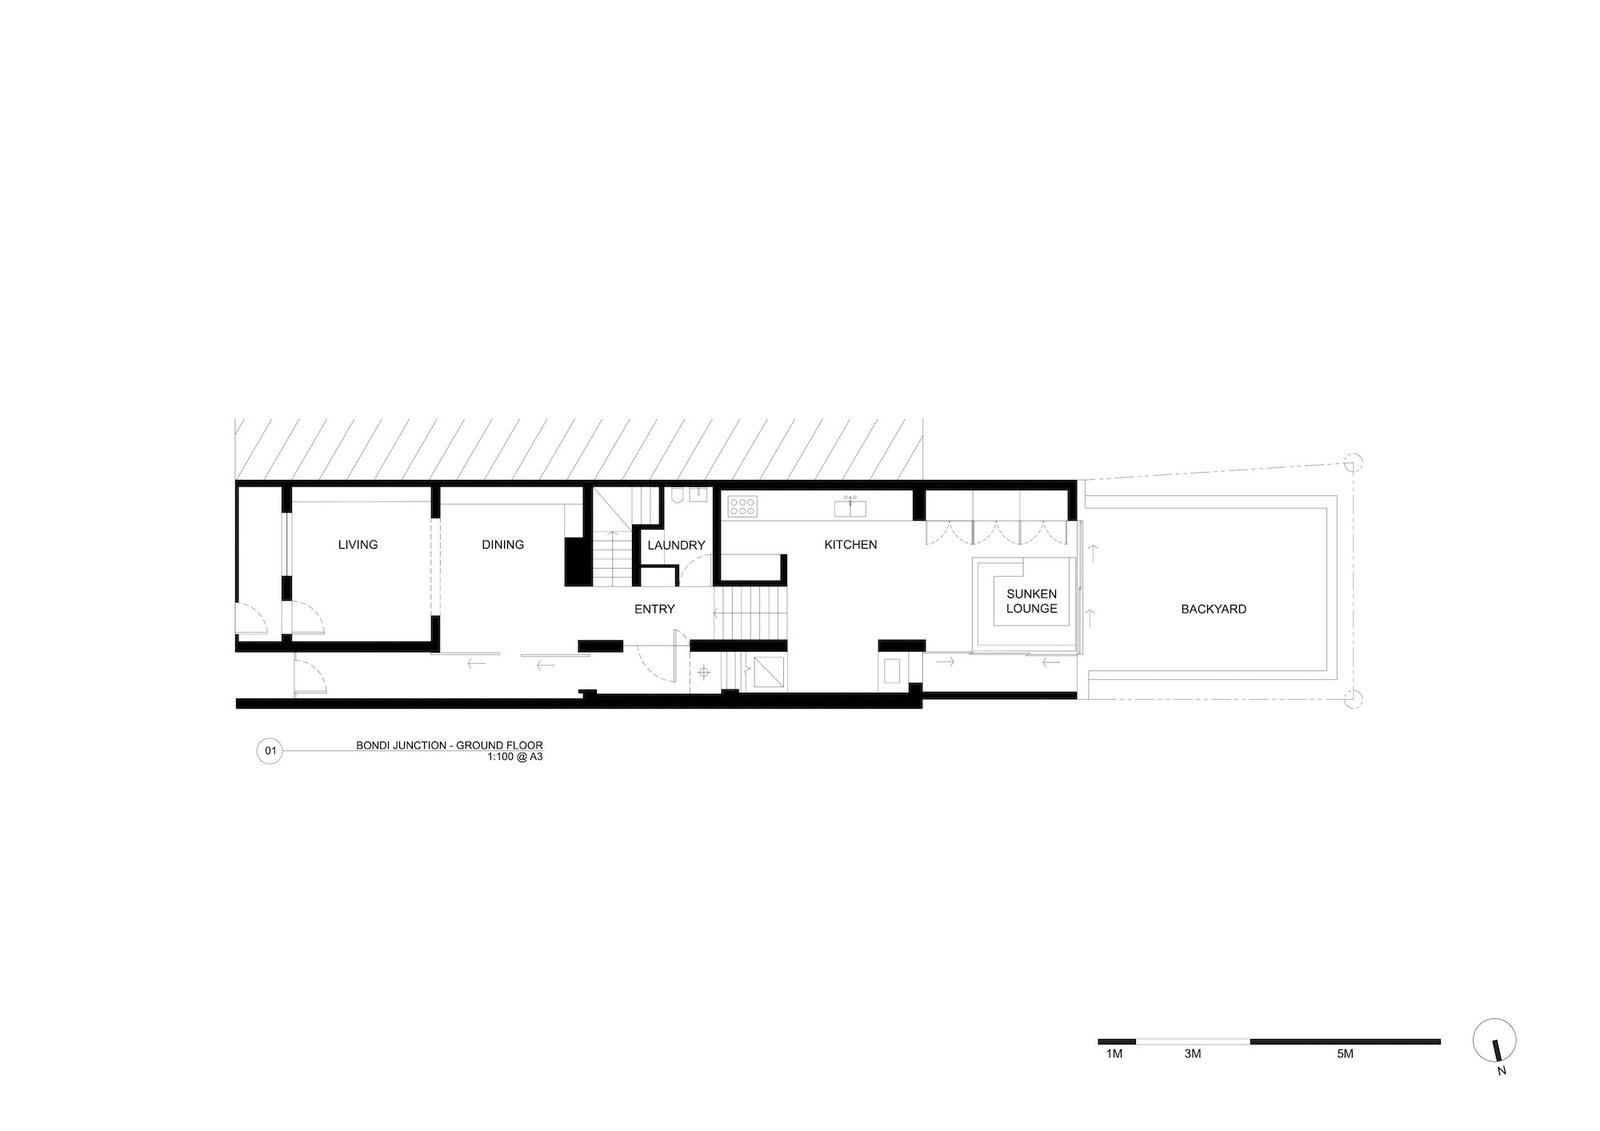 Ground floor plan of Bondi Junction House by Alexander & CO.